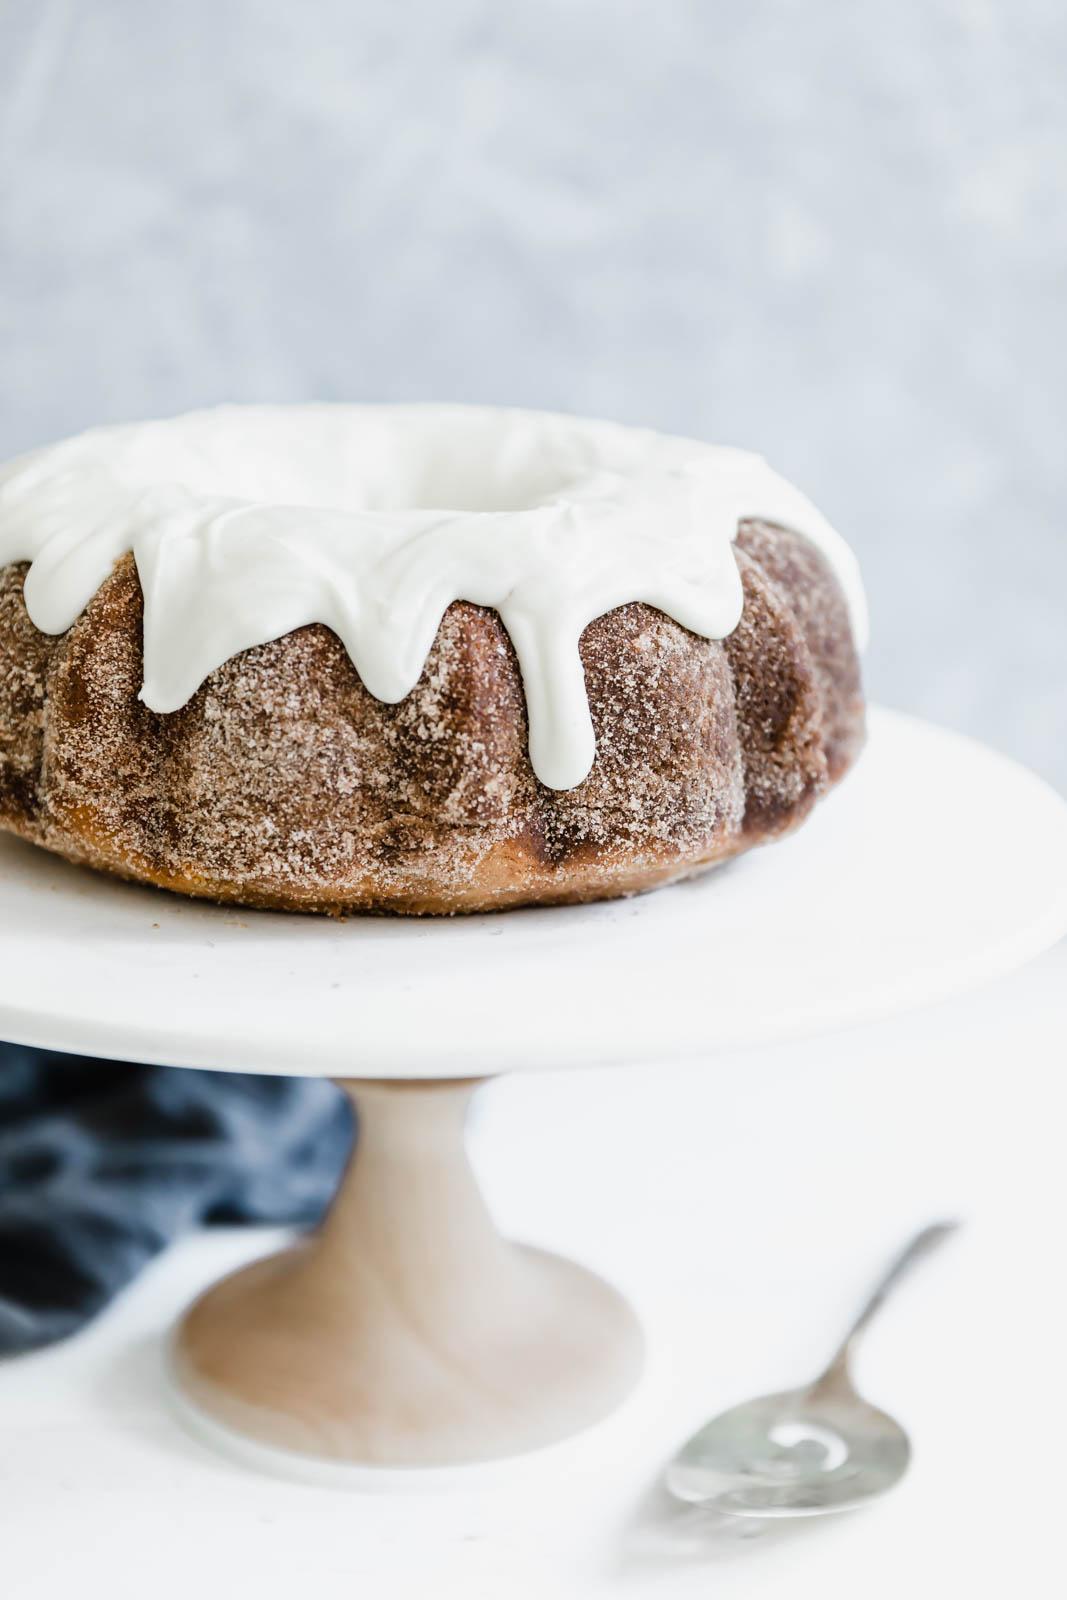 Cinnamon Bundt Cake on a cake stand